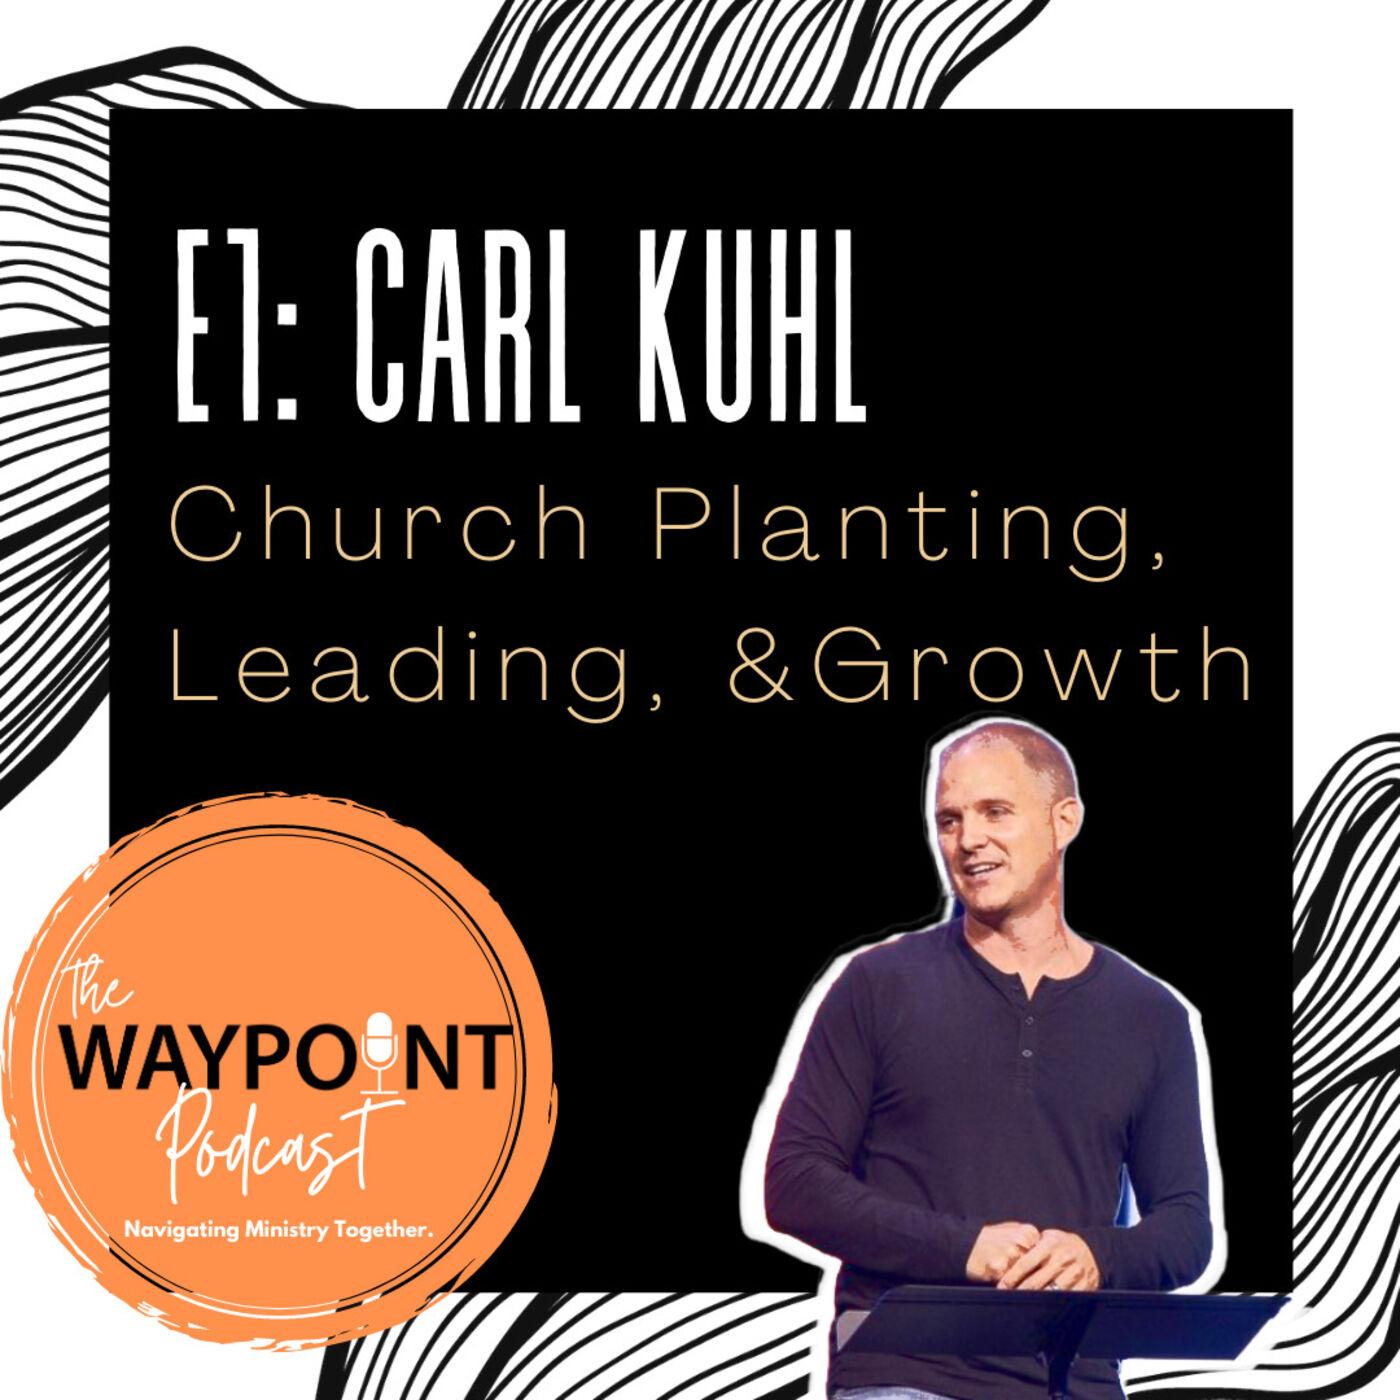 E1: Carl Kuhl | Church Planting, Leading, & Growing